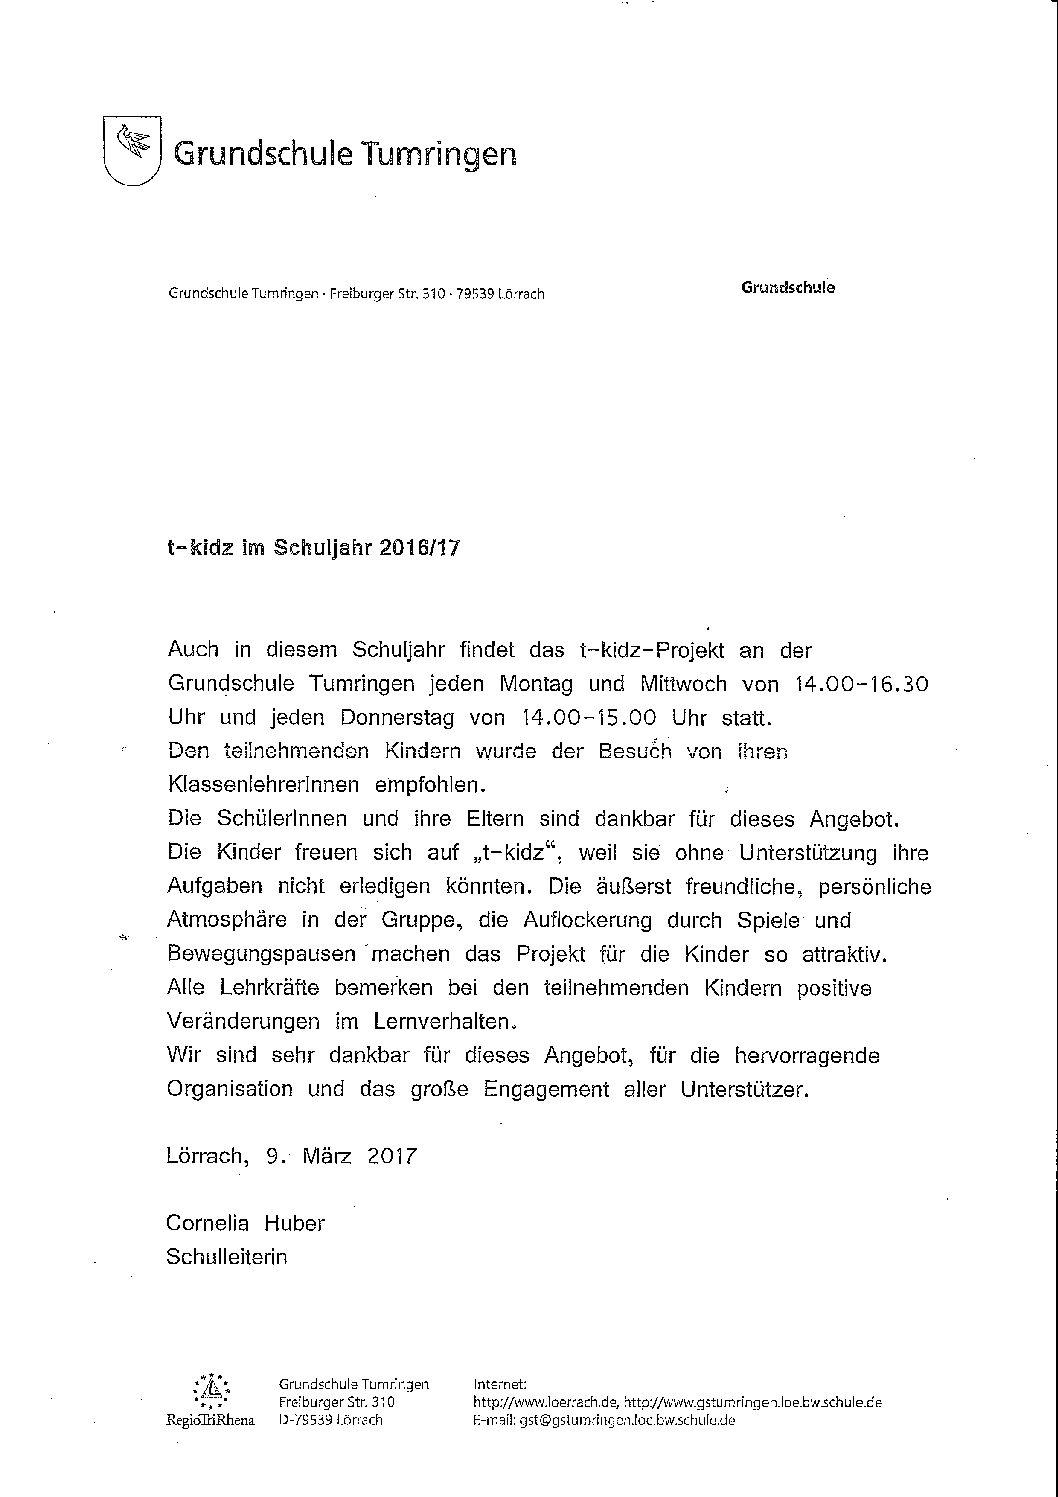 Cornelia Huber - Grundschule Tumringen